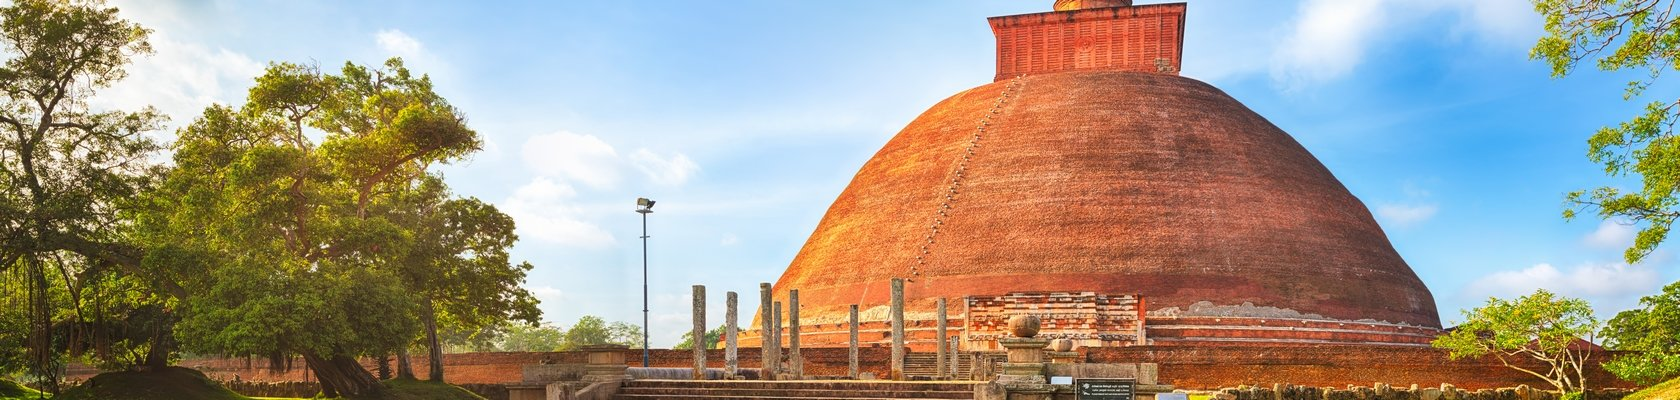 De oude koningsstad Anuradhapura